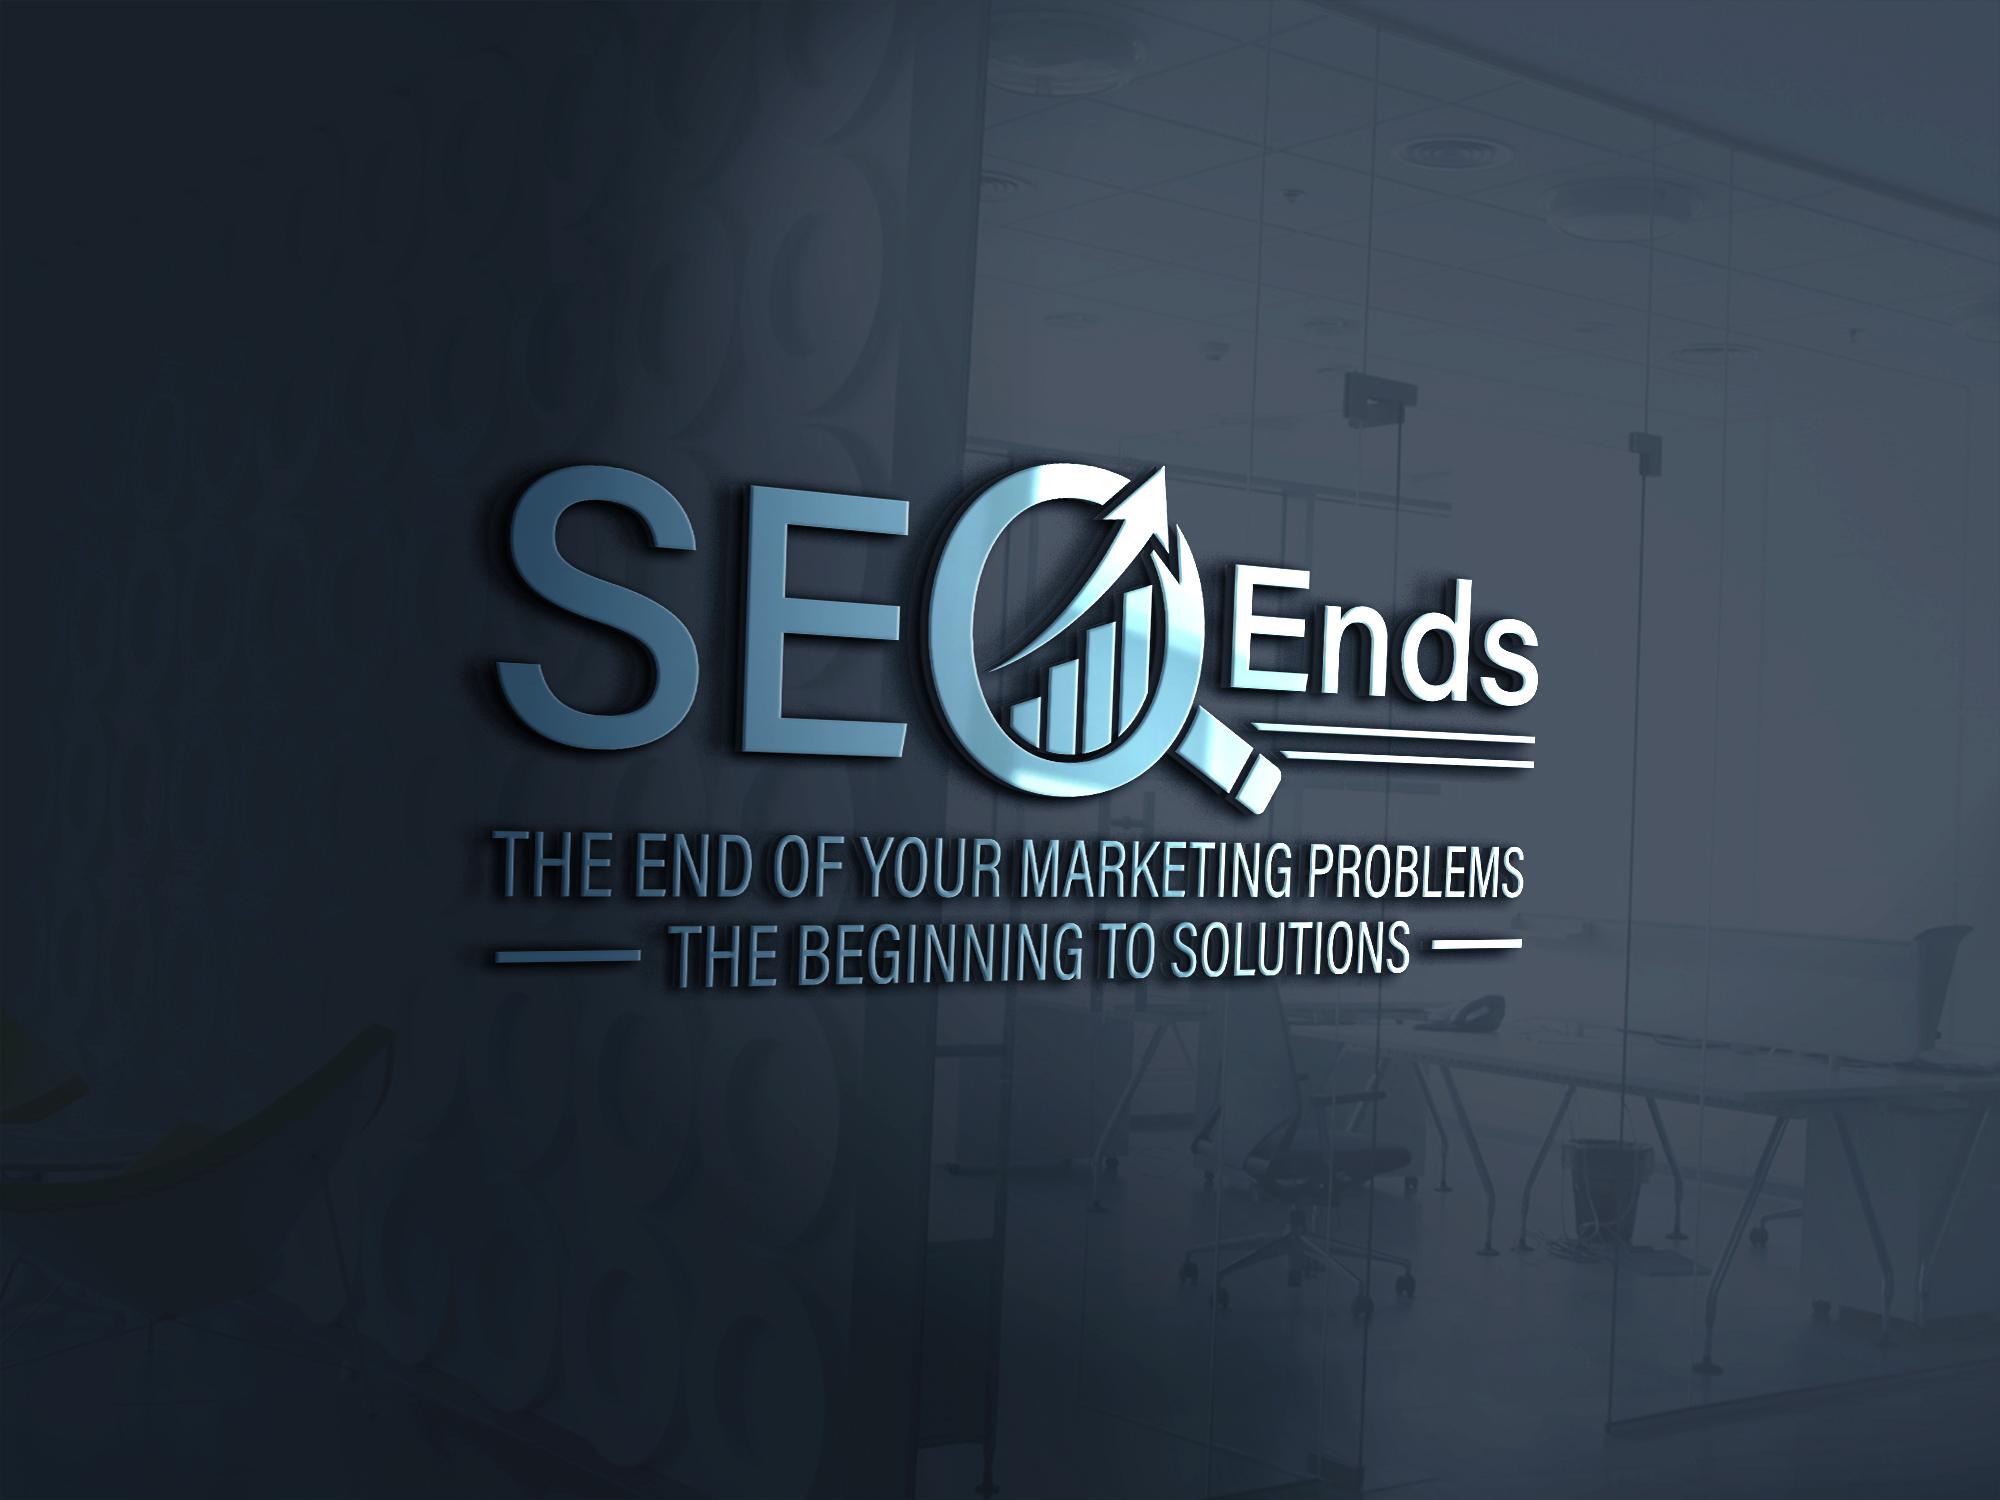 Seo Ends